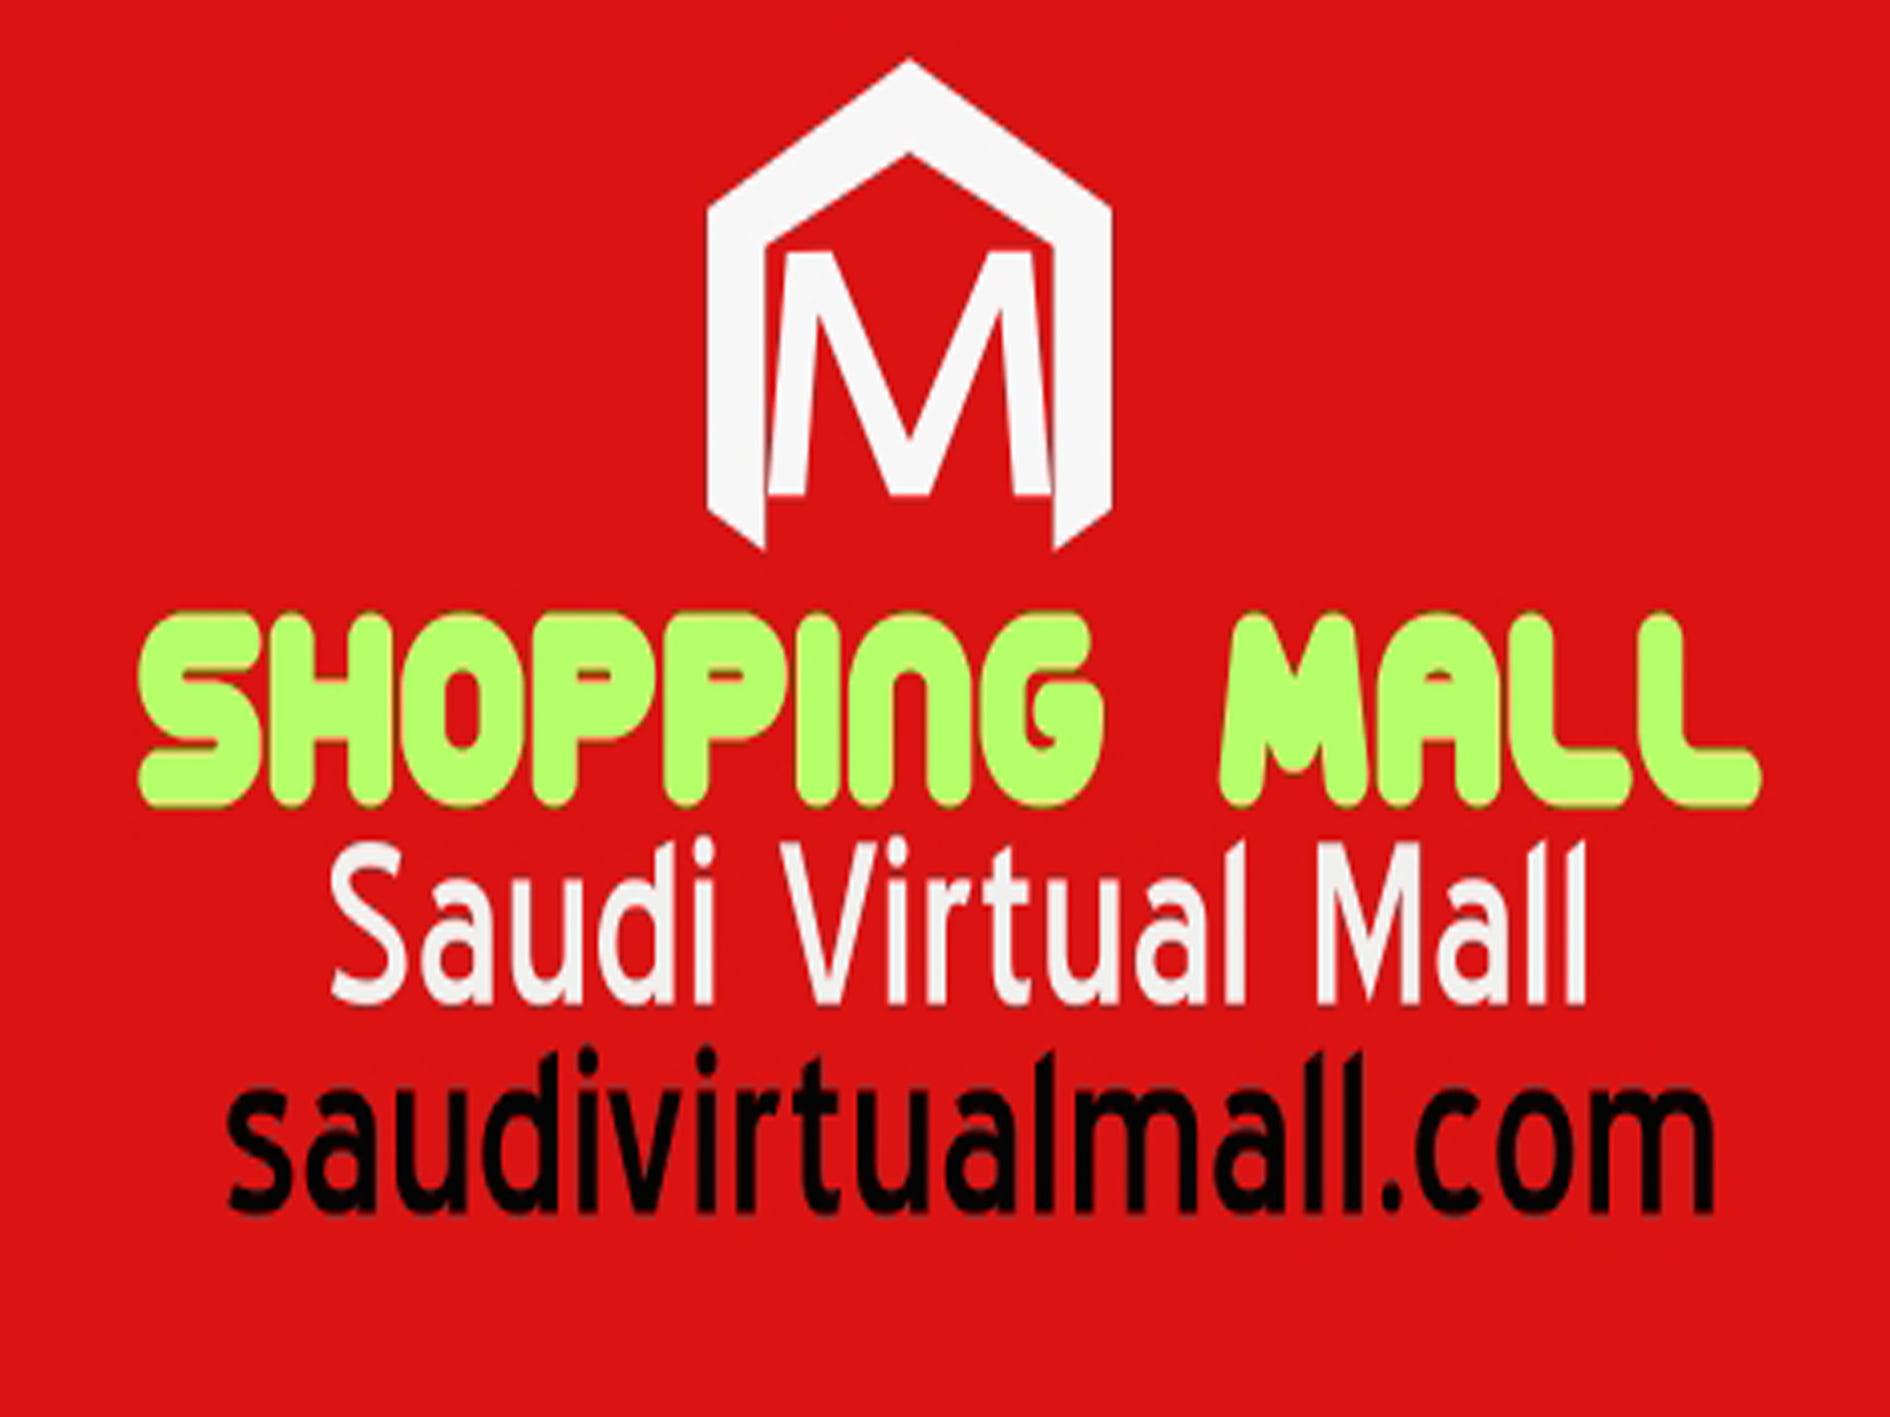 saudi mall logo 1900x1400 1